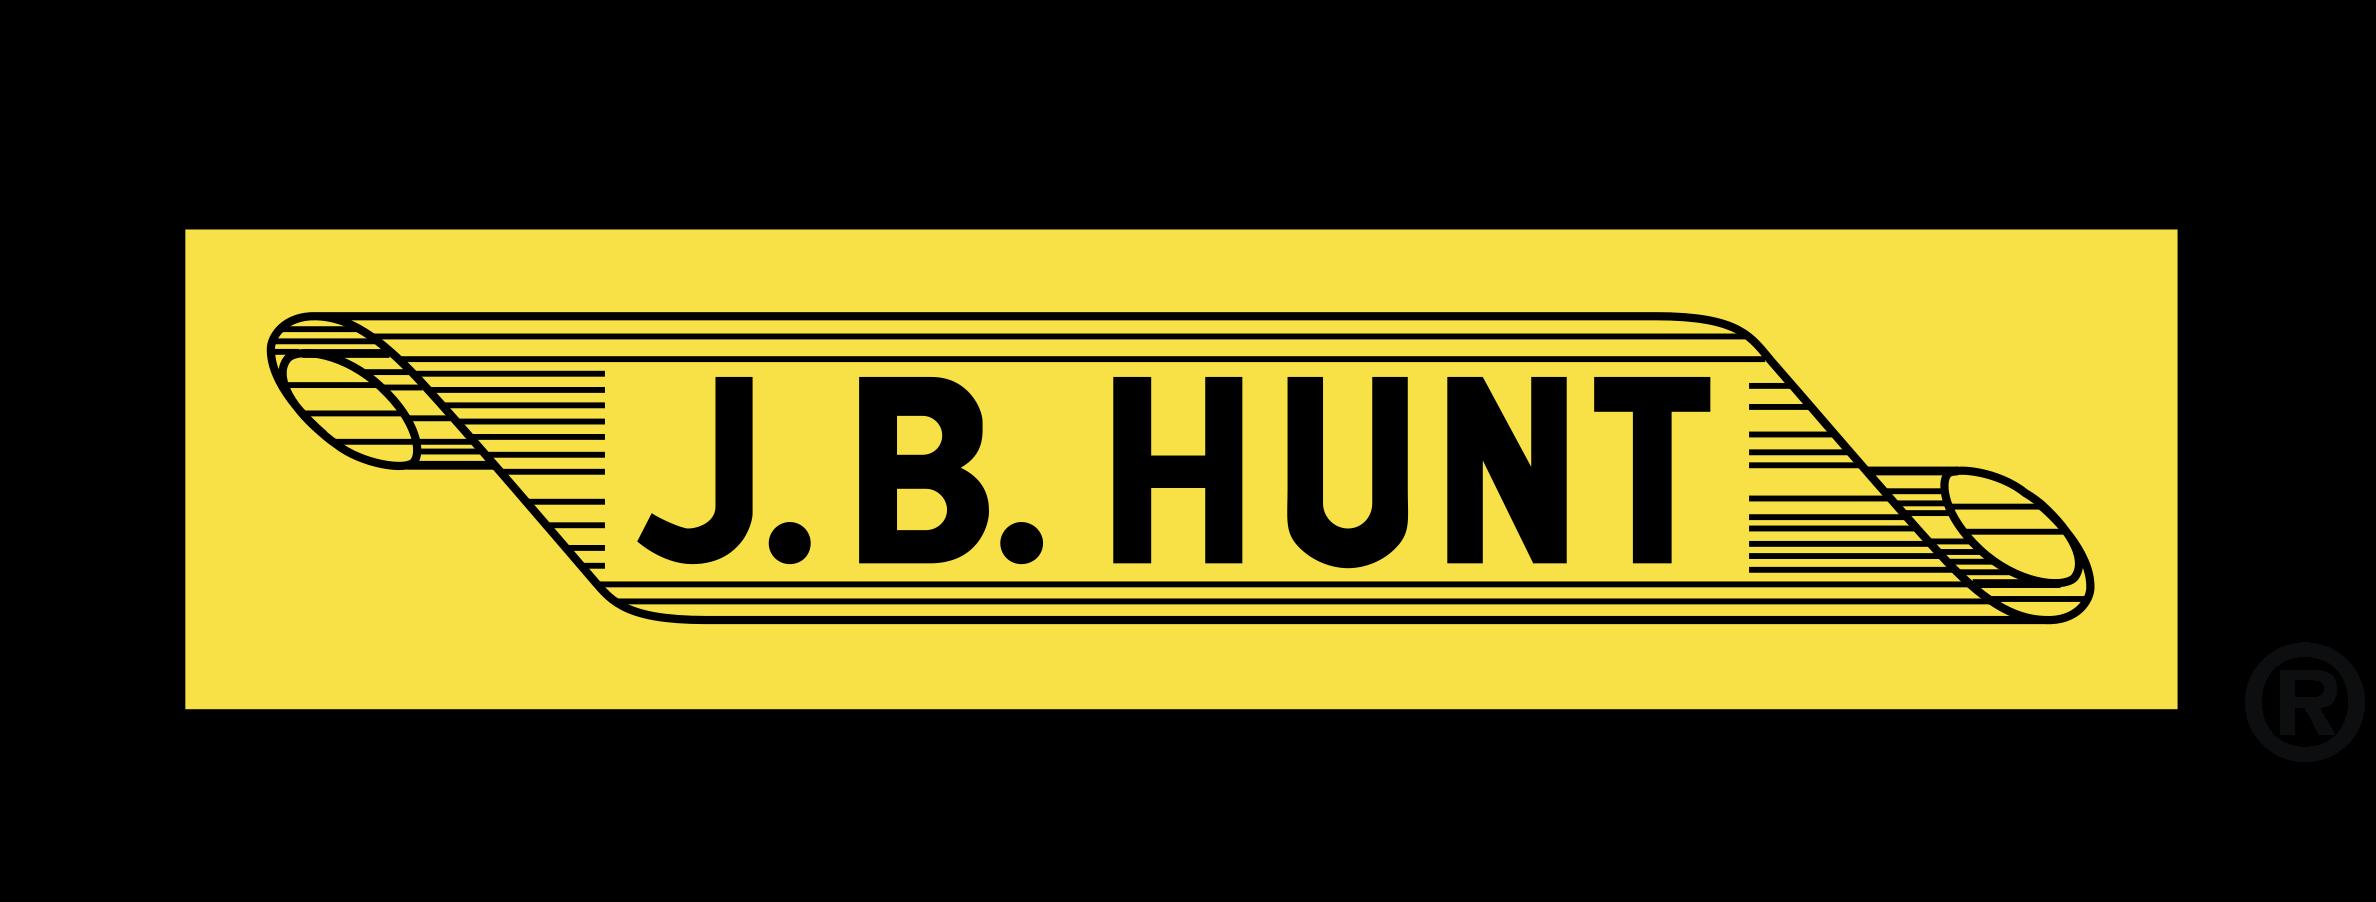 j-b-hunt-logo-png-transparent1